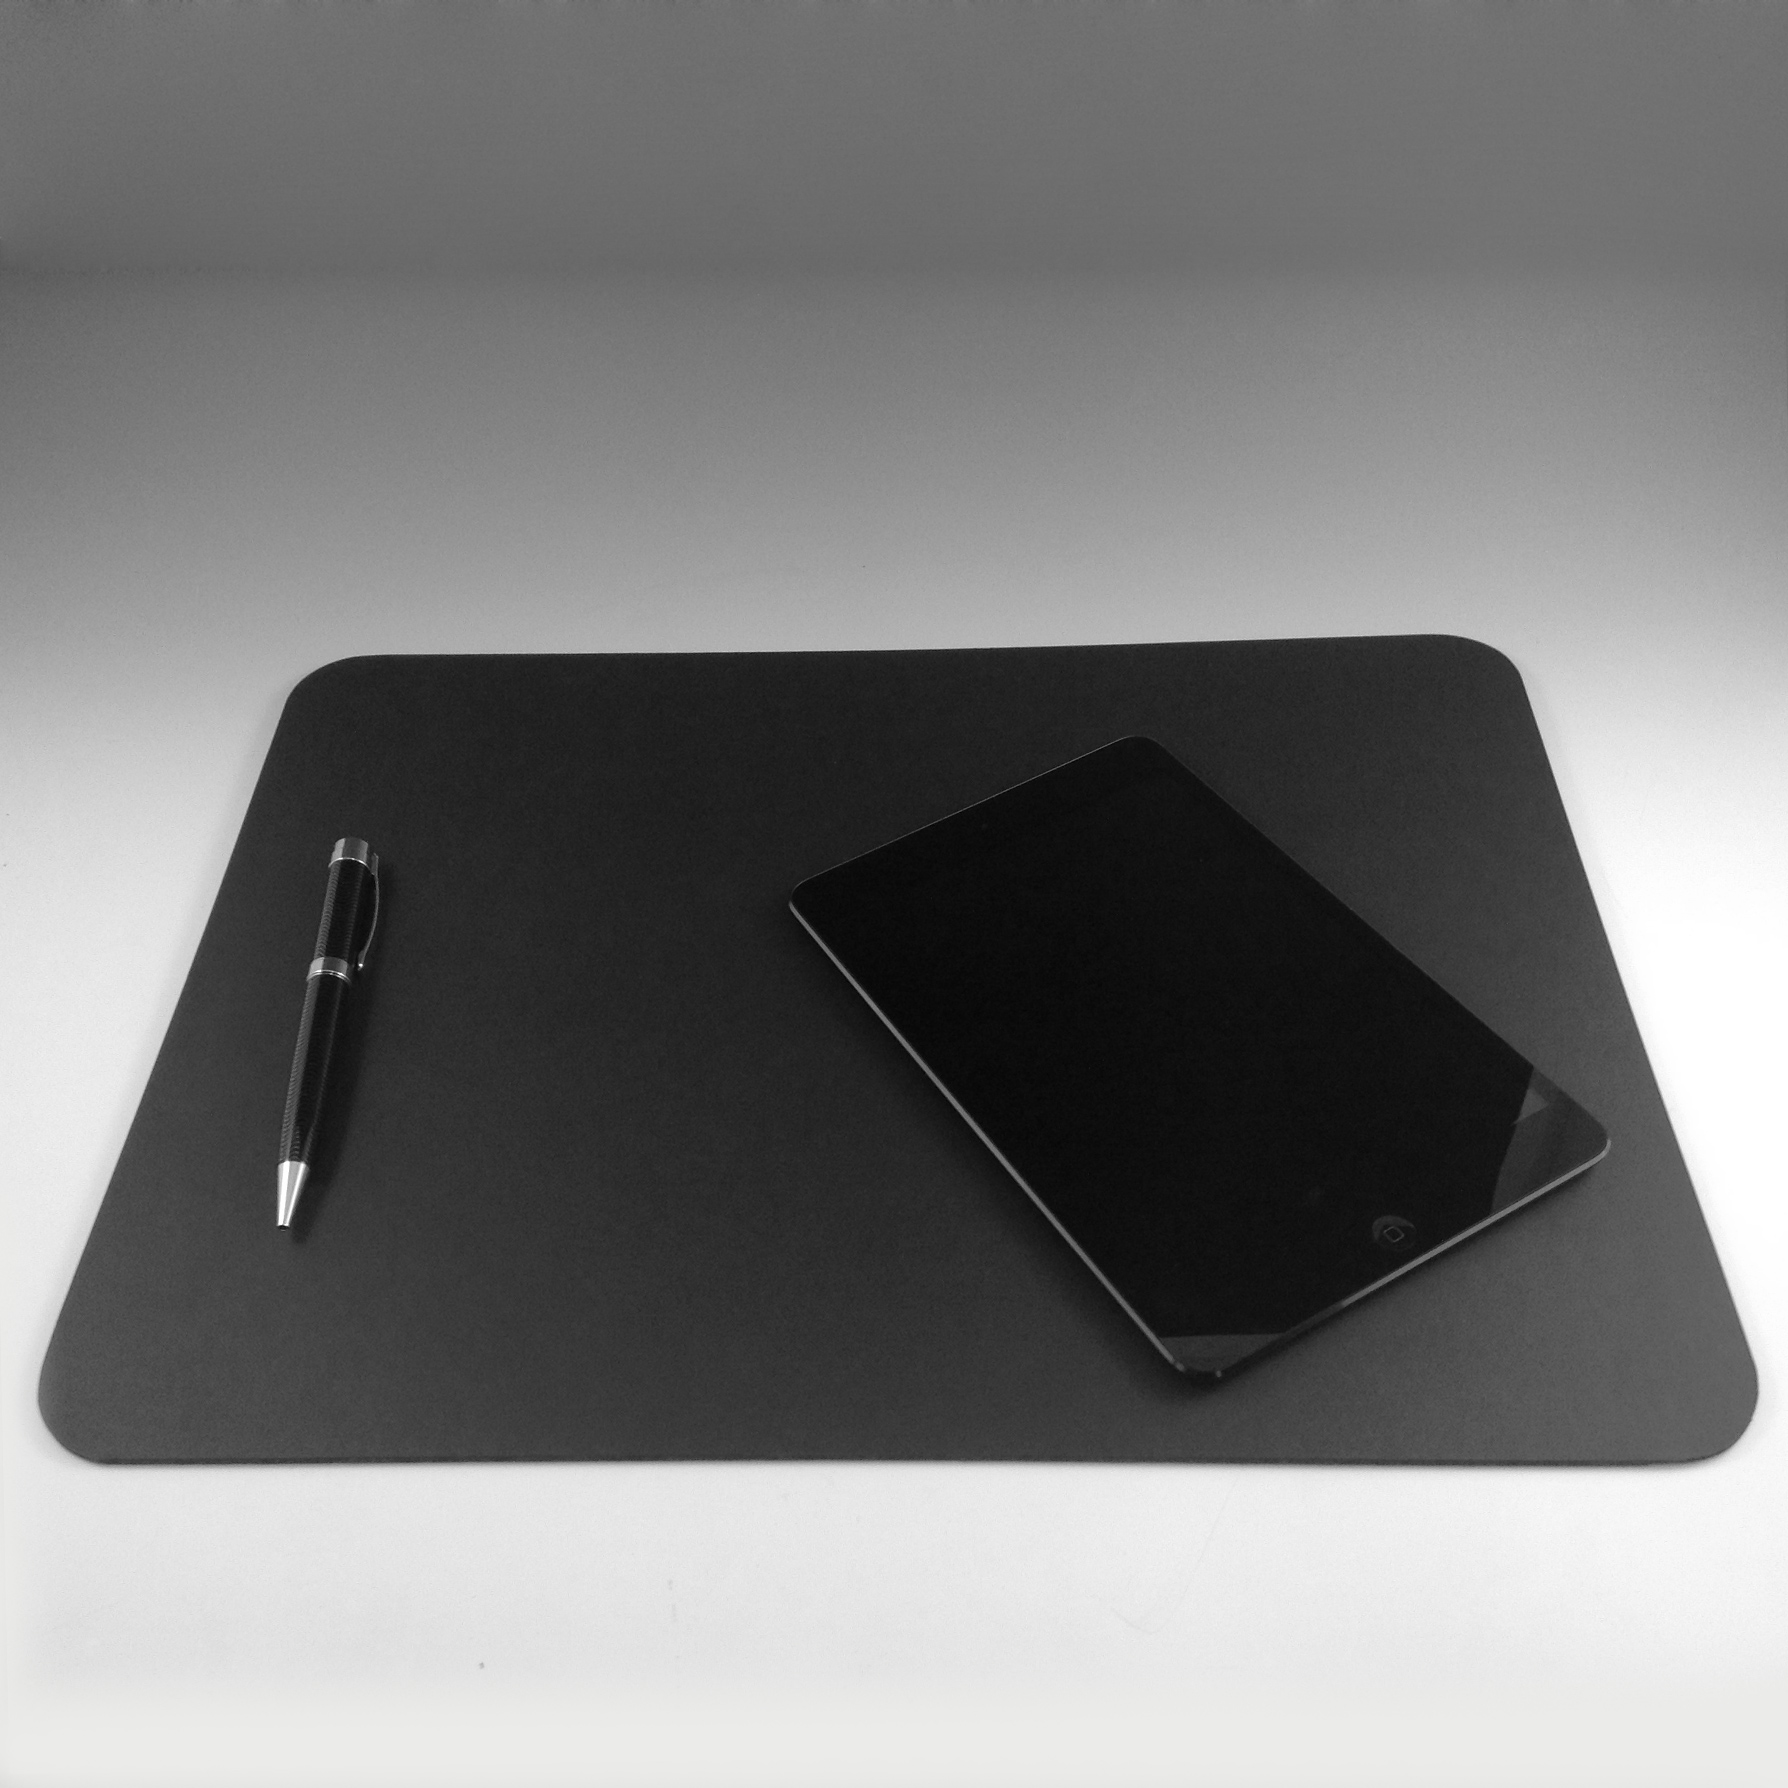 Linoleum Desk Pad Rectangular Pad For Desks Amp Boardrooms